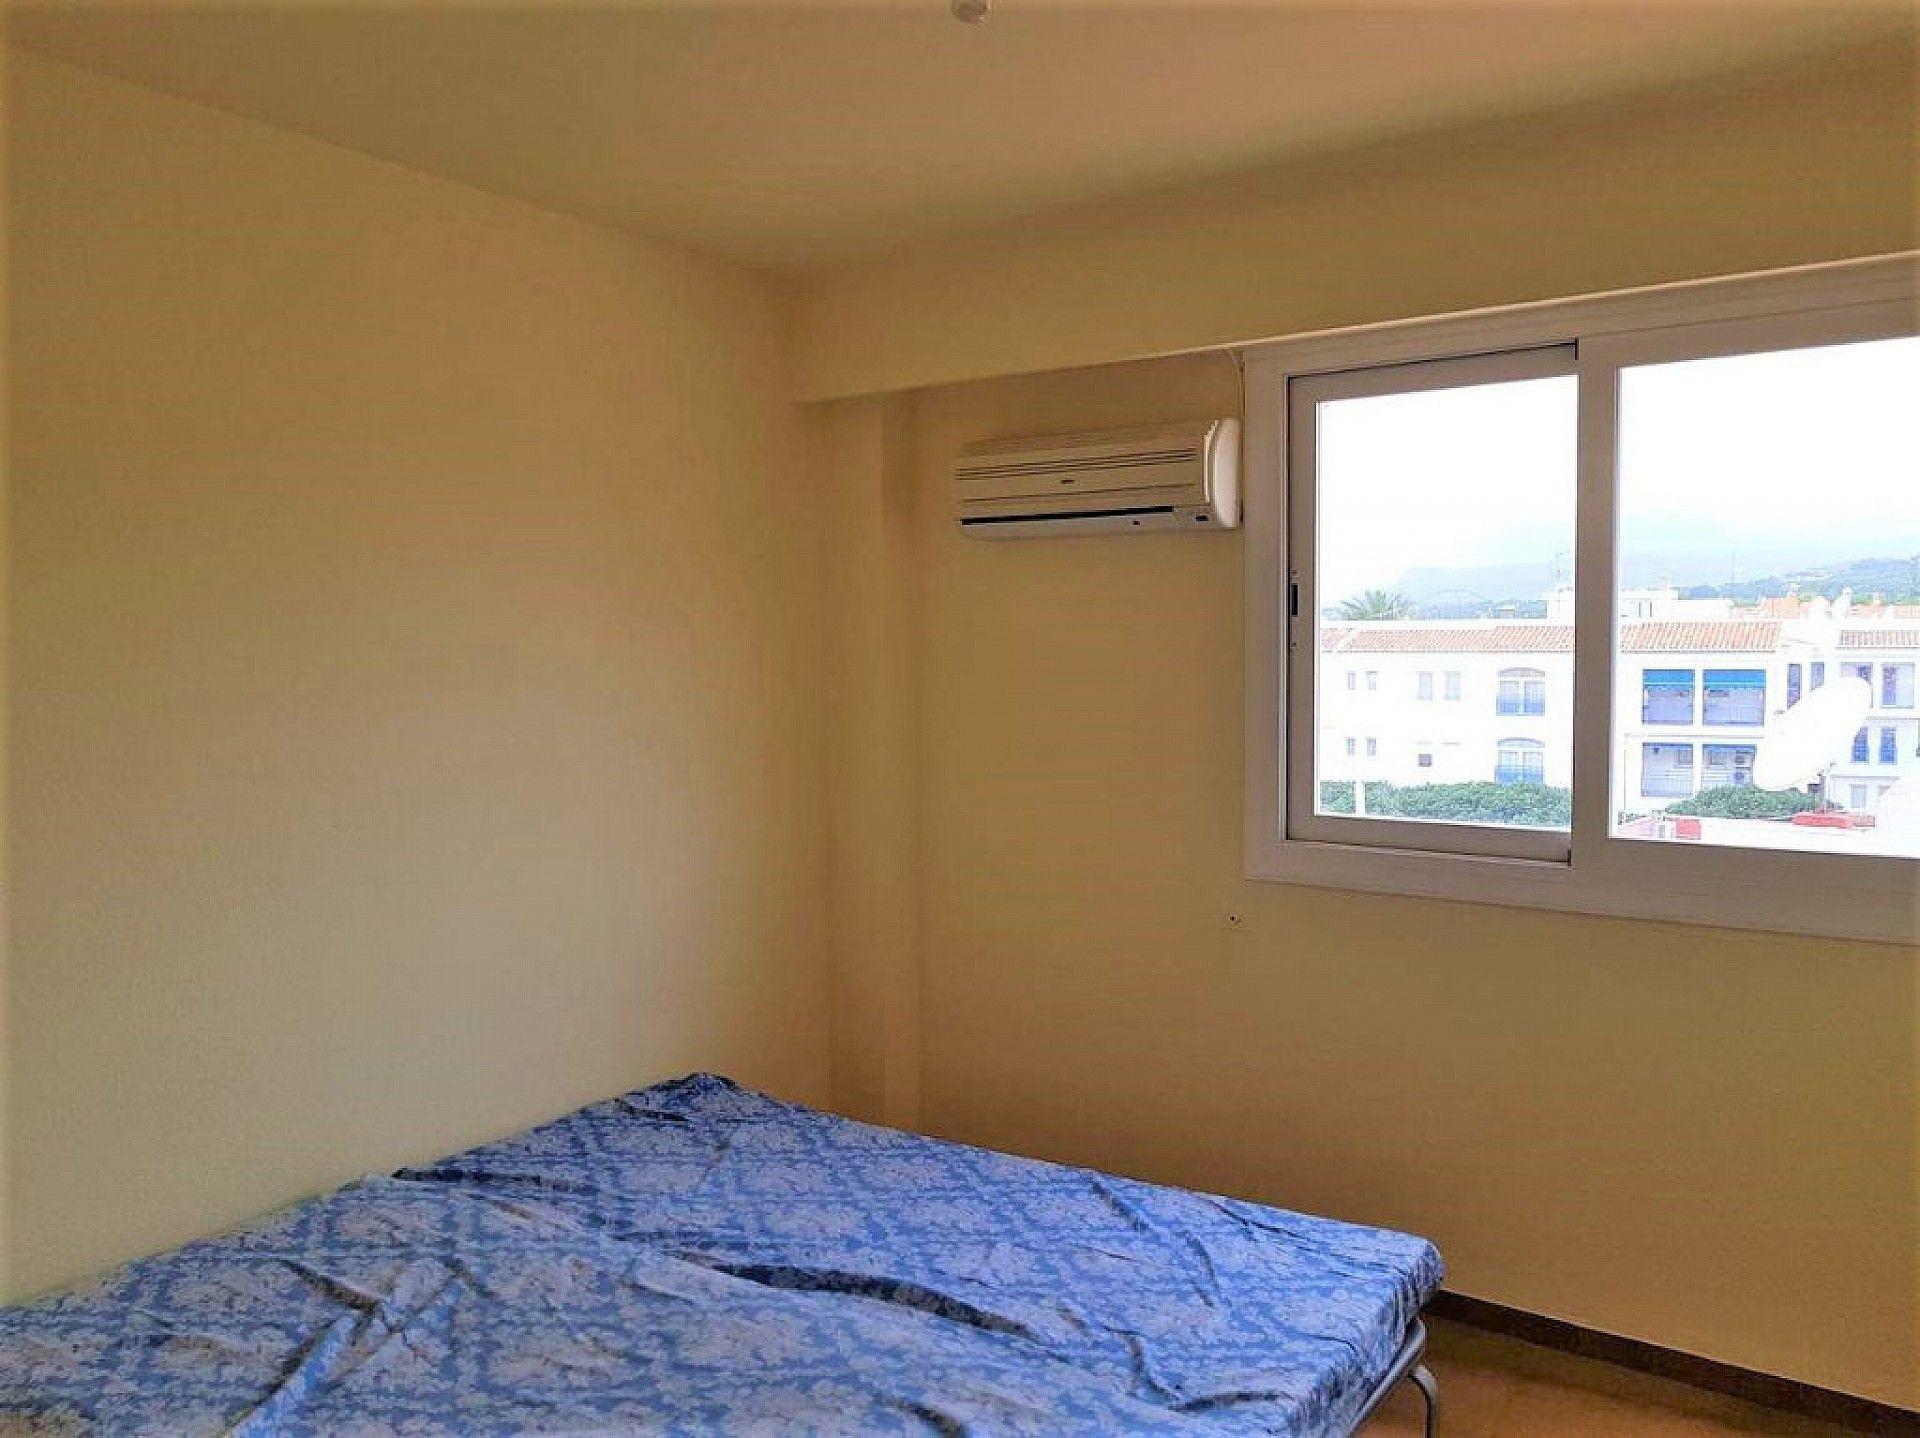 w_te-koop-moraira-centre-apartment-costa-blanca-spain-a2026-07-3.jpg